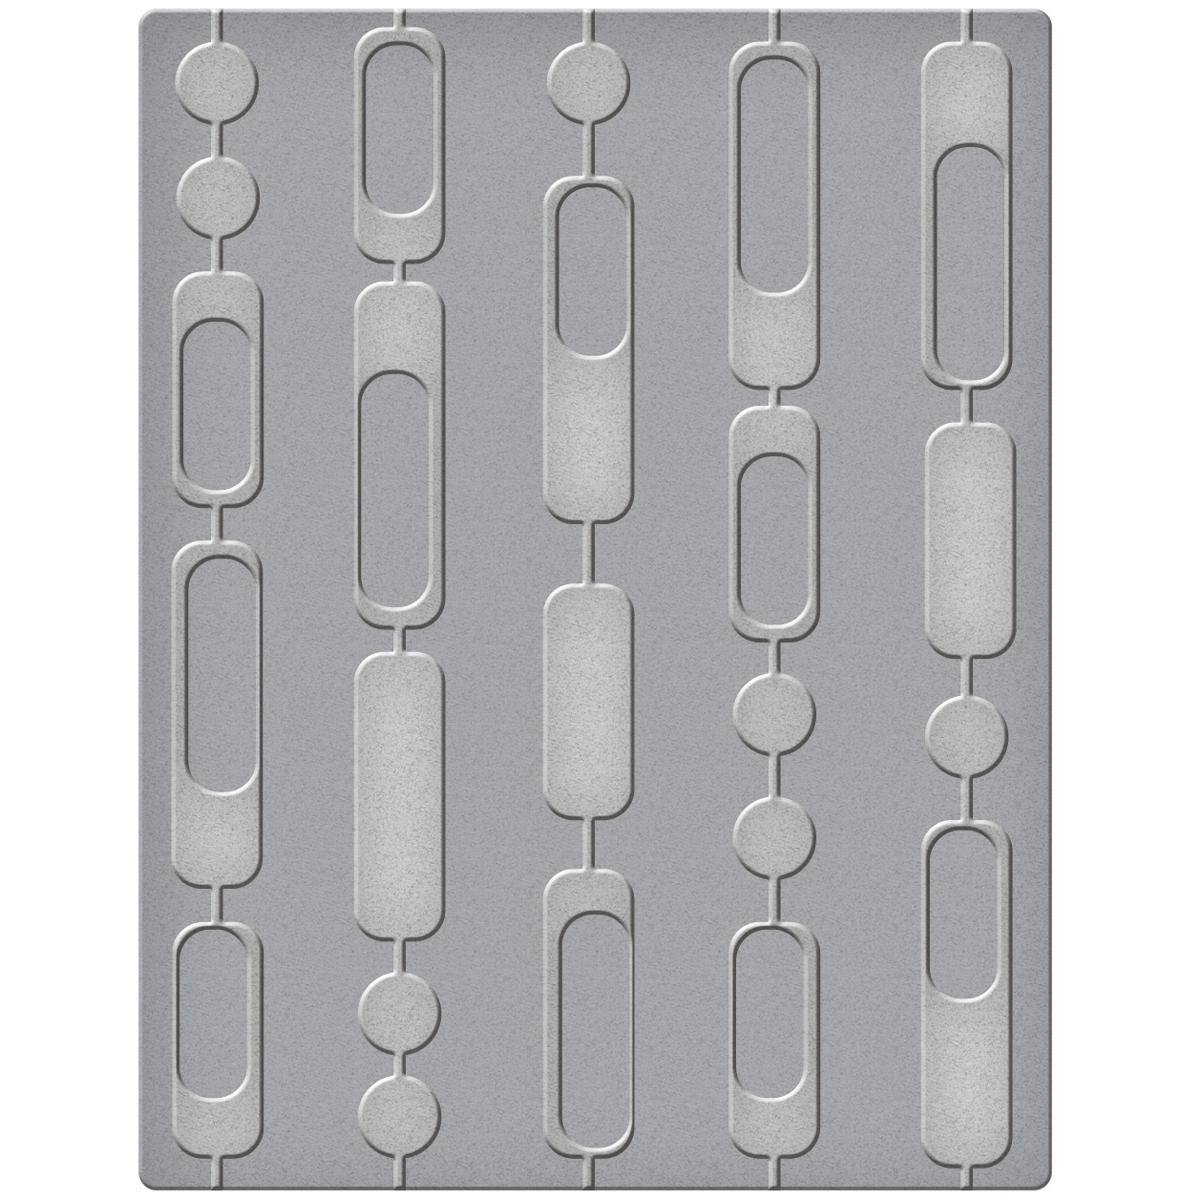 Spellbinders Embossing Folder, Small, Curtain Beads